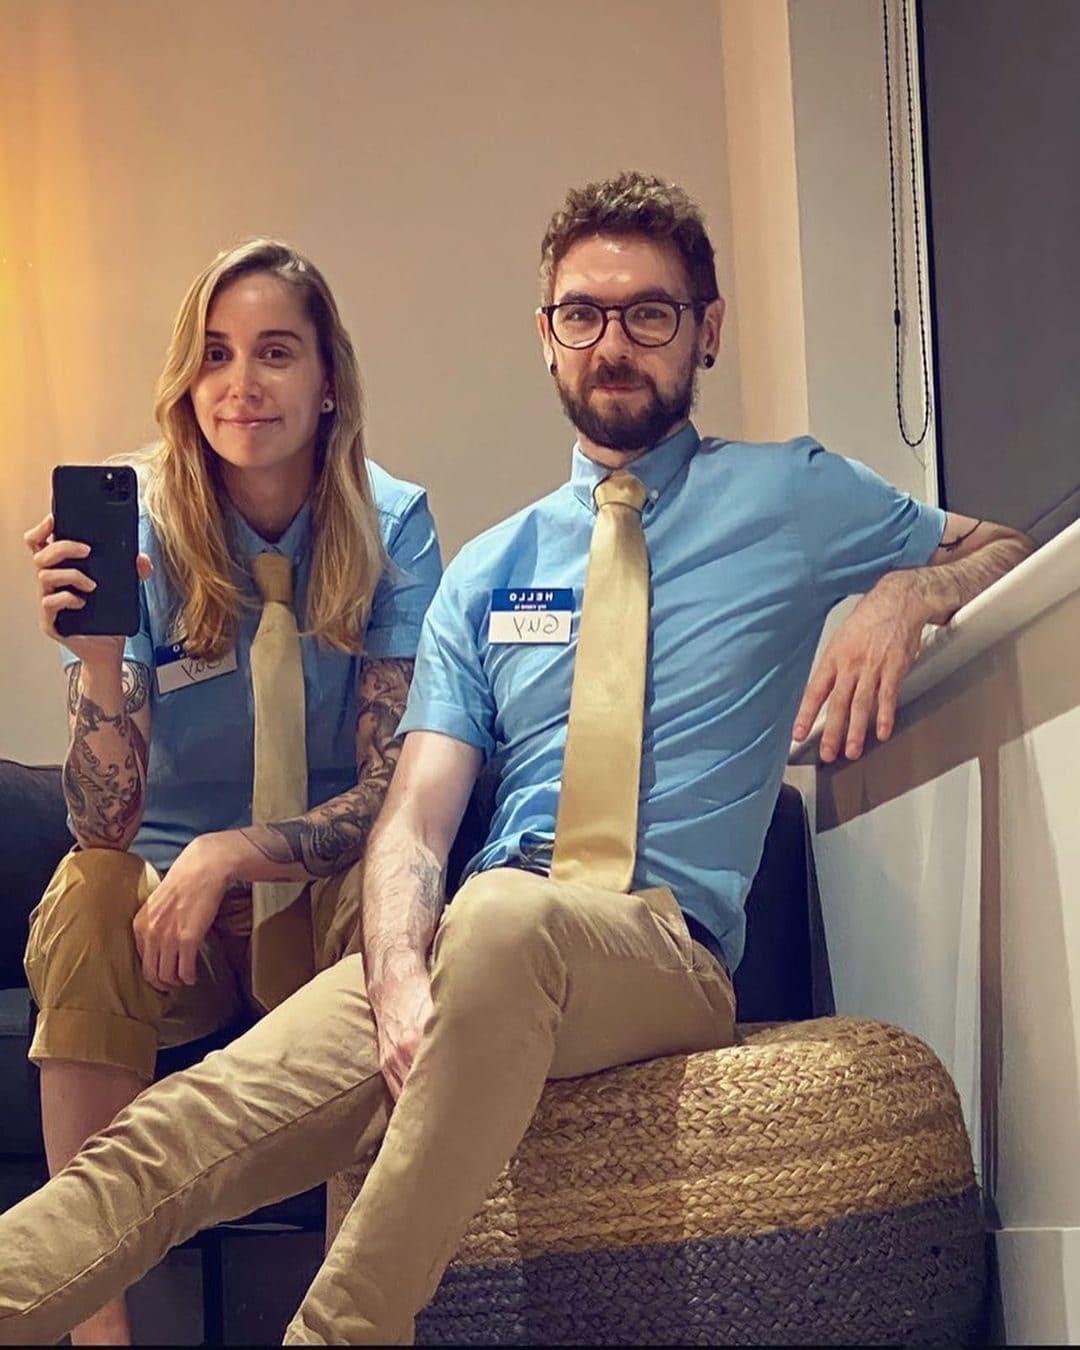 Jacksepticeye with his girlfriend Gab Smolders